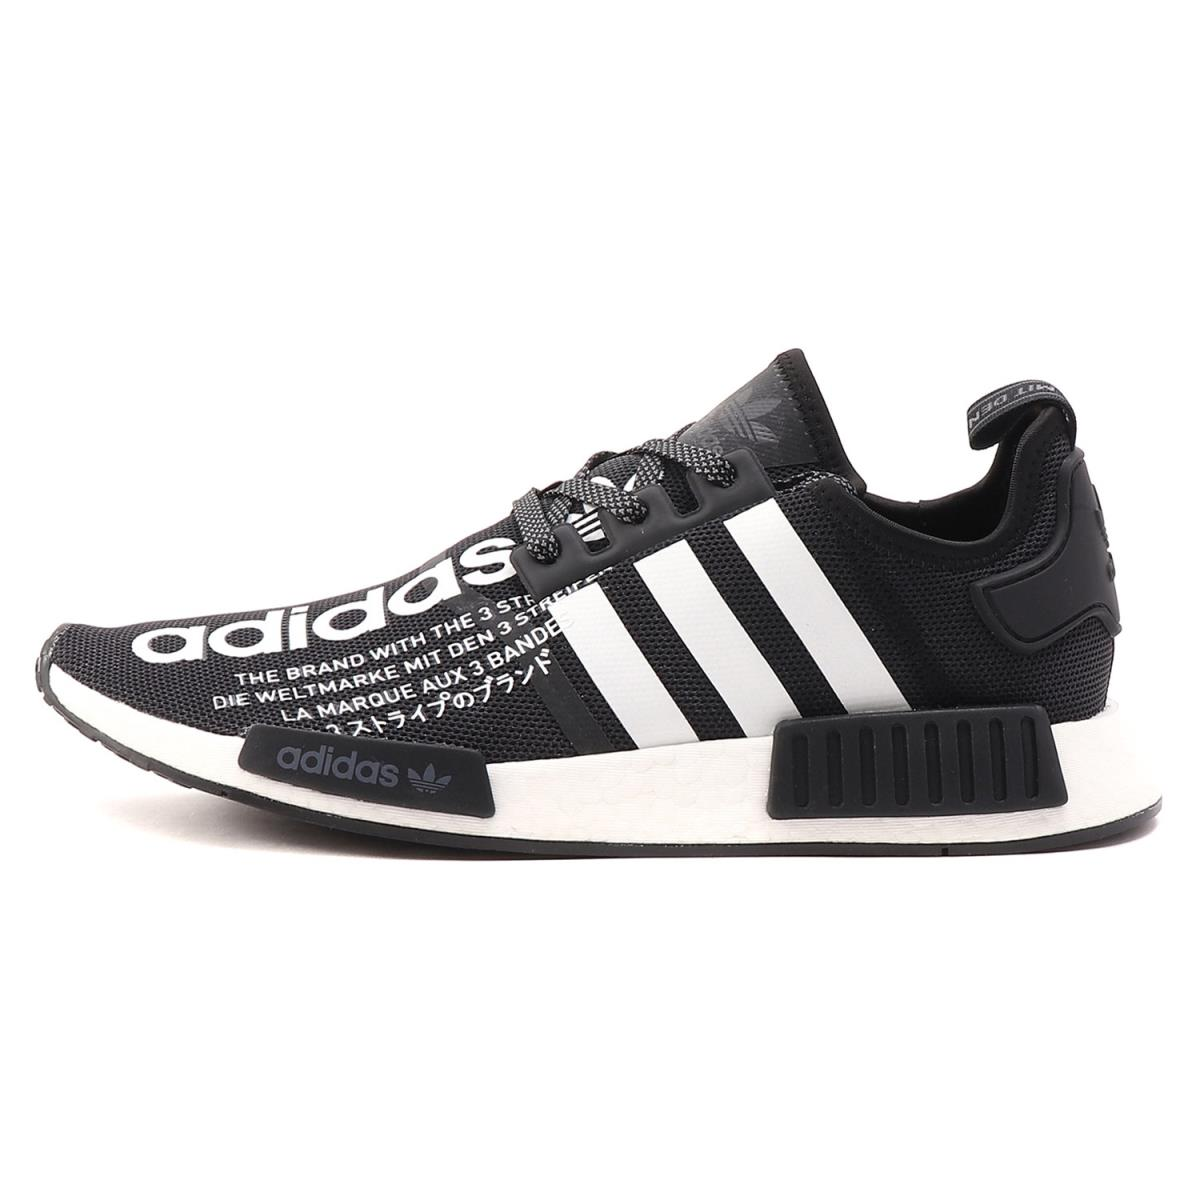 low priced 4c367 3b435 adidas (Adidas) 18A/W X ATMOS NMD R1 ATMOS(G27331) core black US10.5(28.5cm)